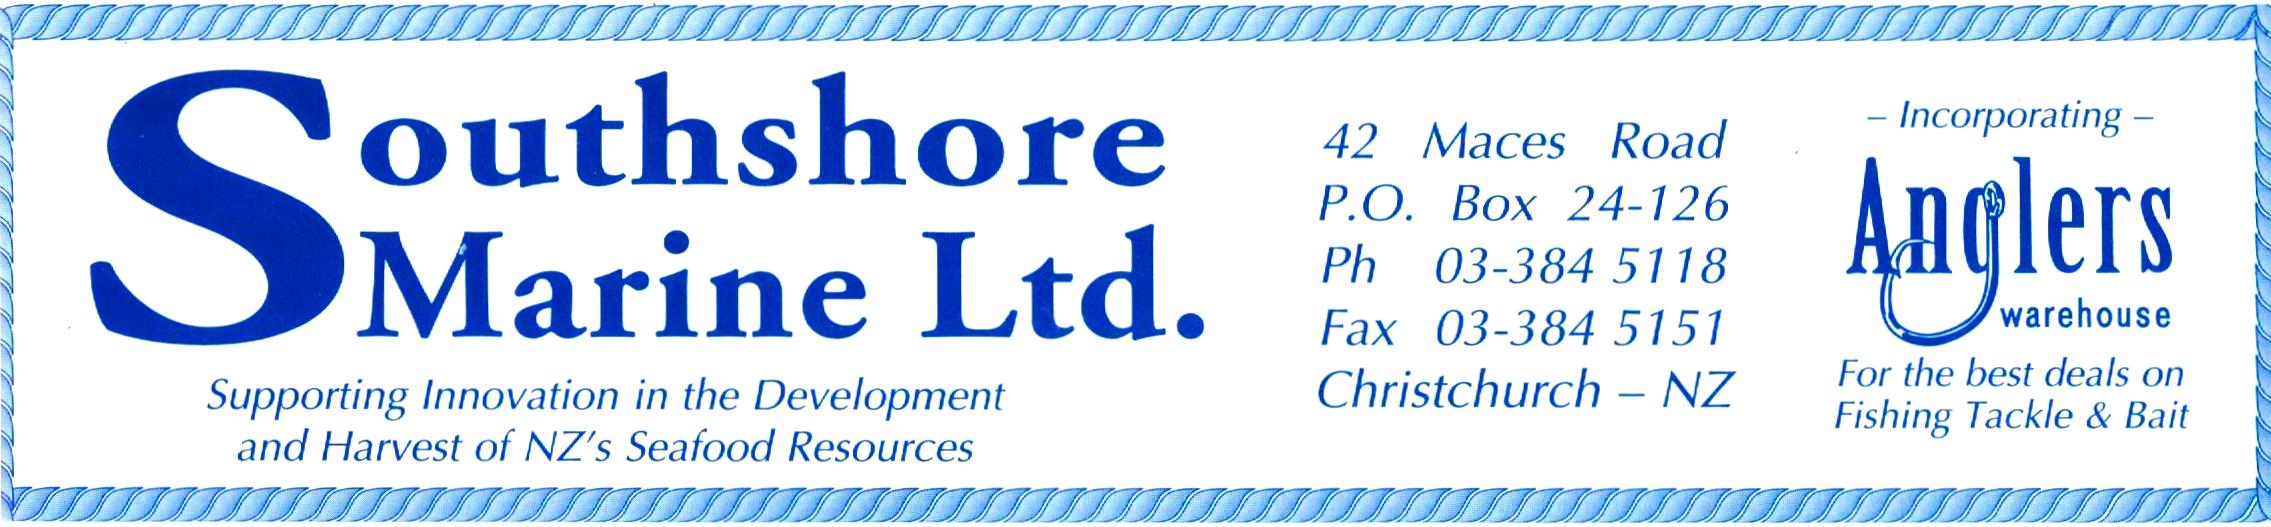 Southshore Marine Ltd.